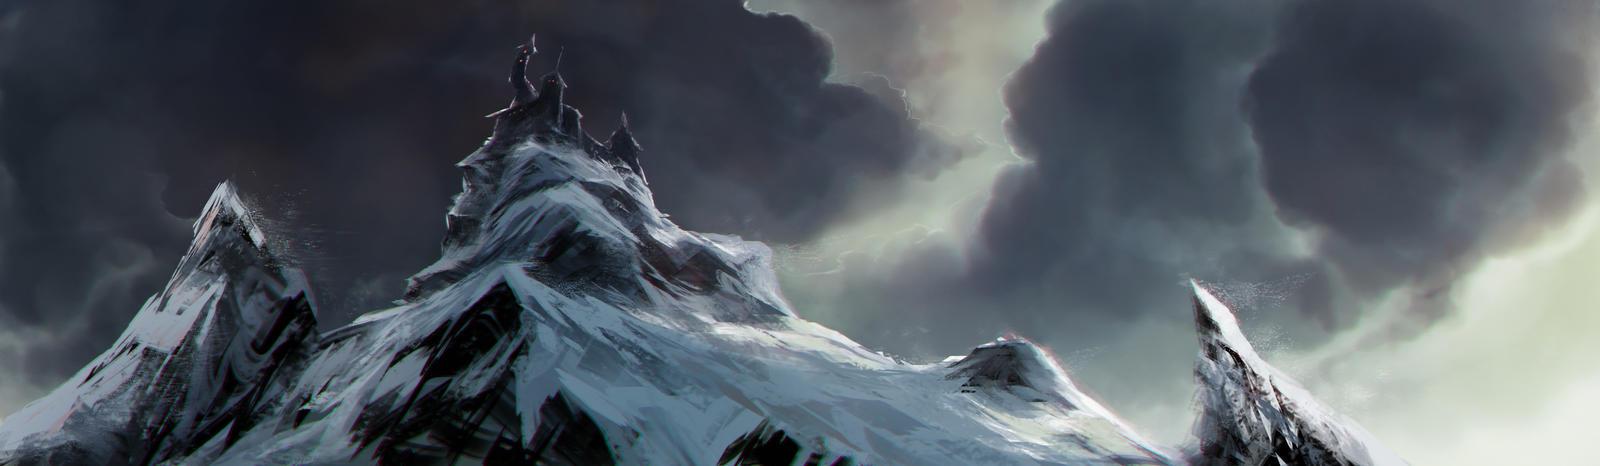 SnowMountain by drazebot